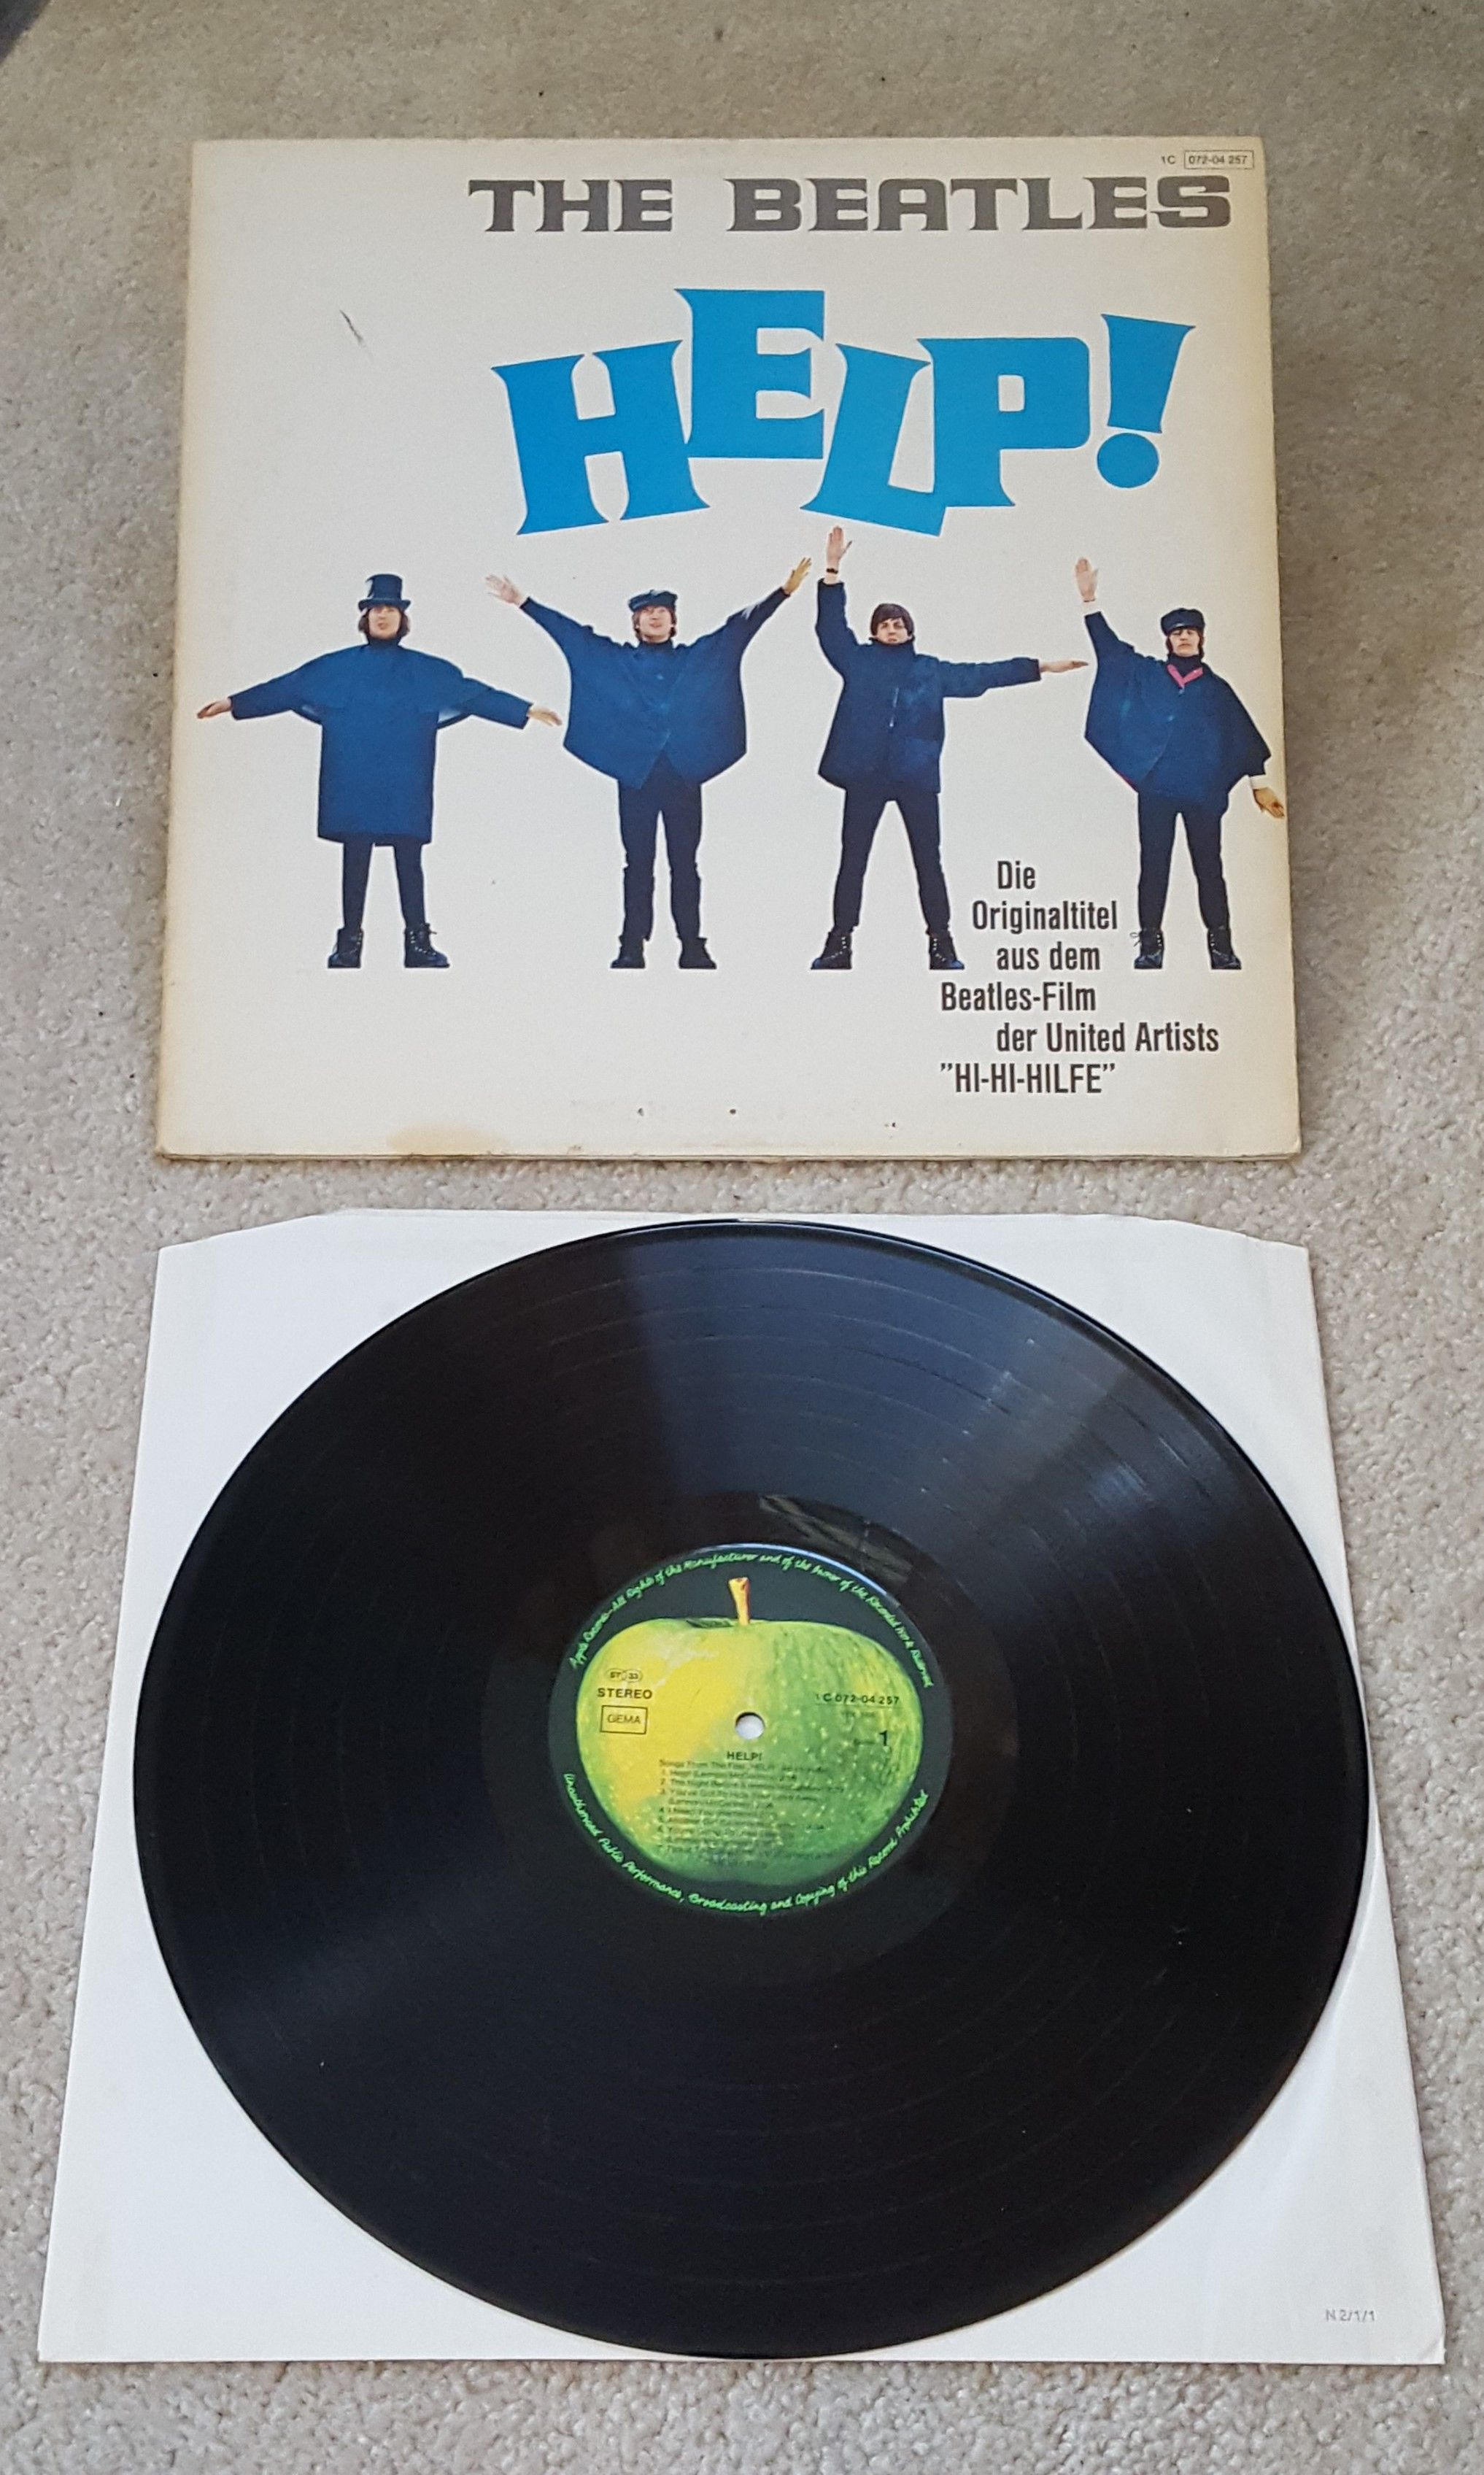 Beatles Thebeatles Vinyl Record Rare Germanimport